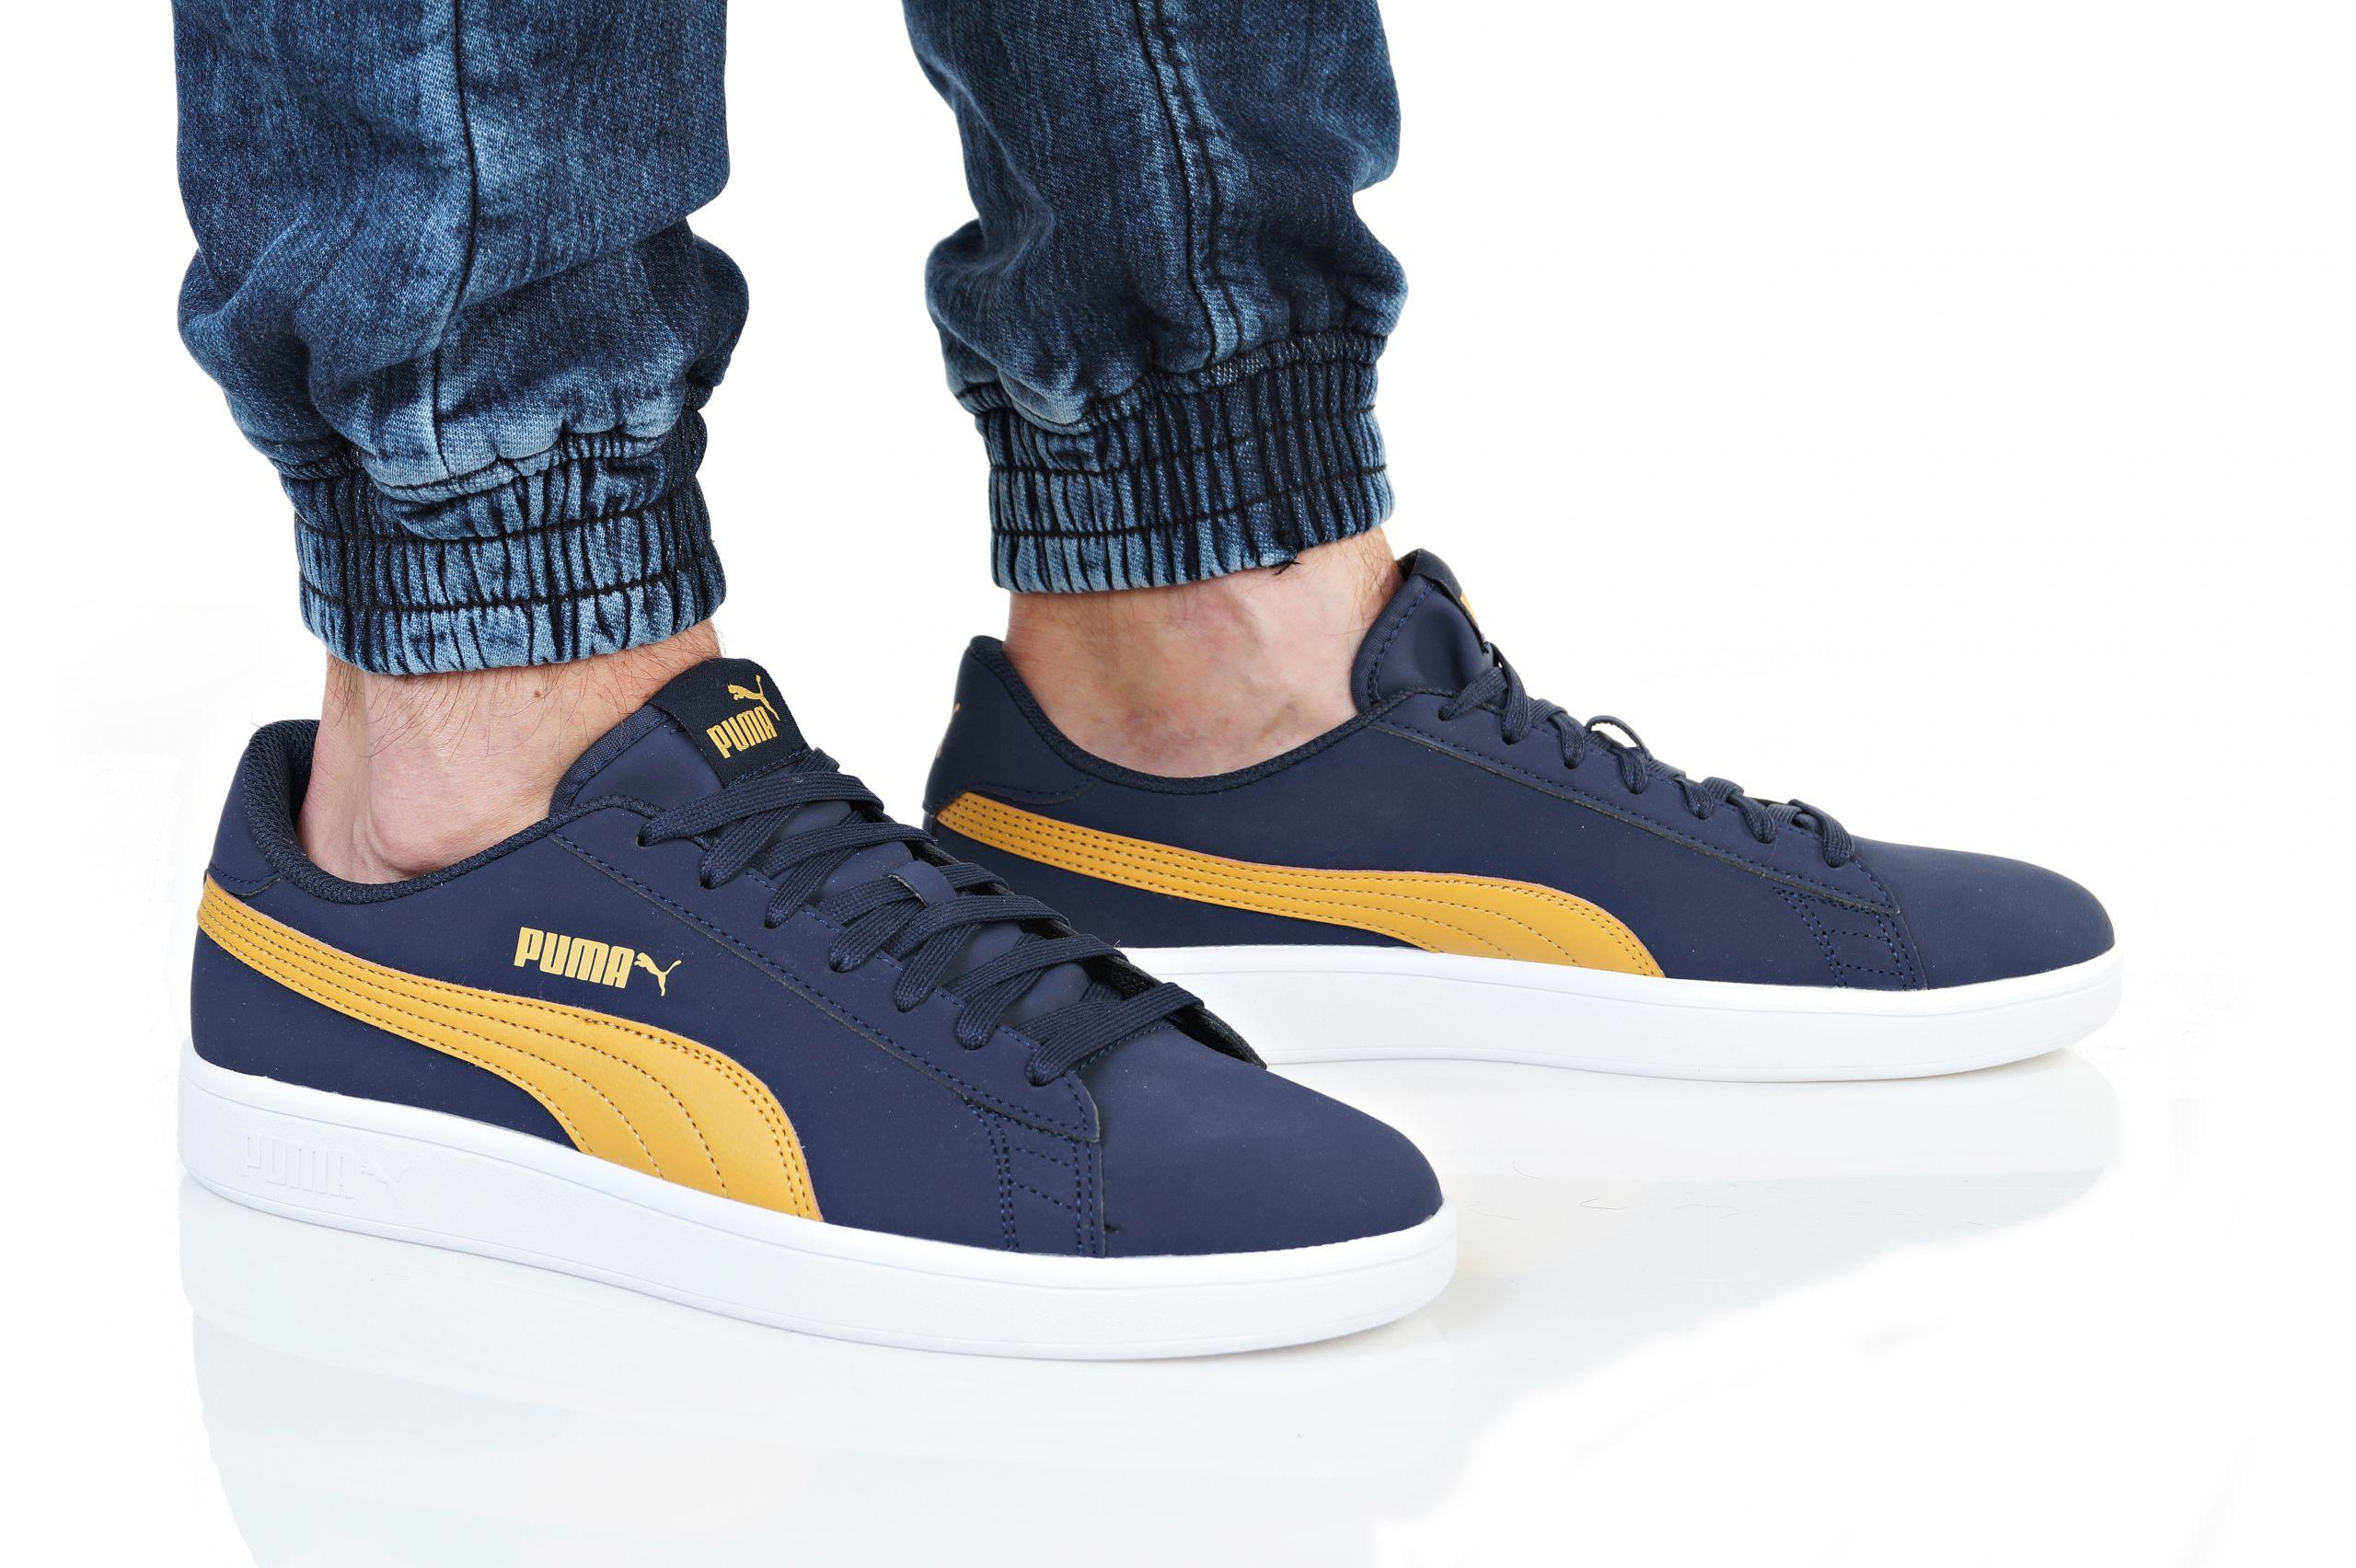 7cd157144029af Puma Shoes Sneakers Sports Smash v2 Buck Peacoat Blue Nubuck